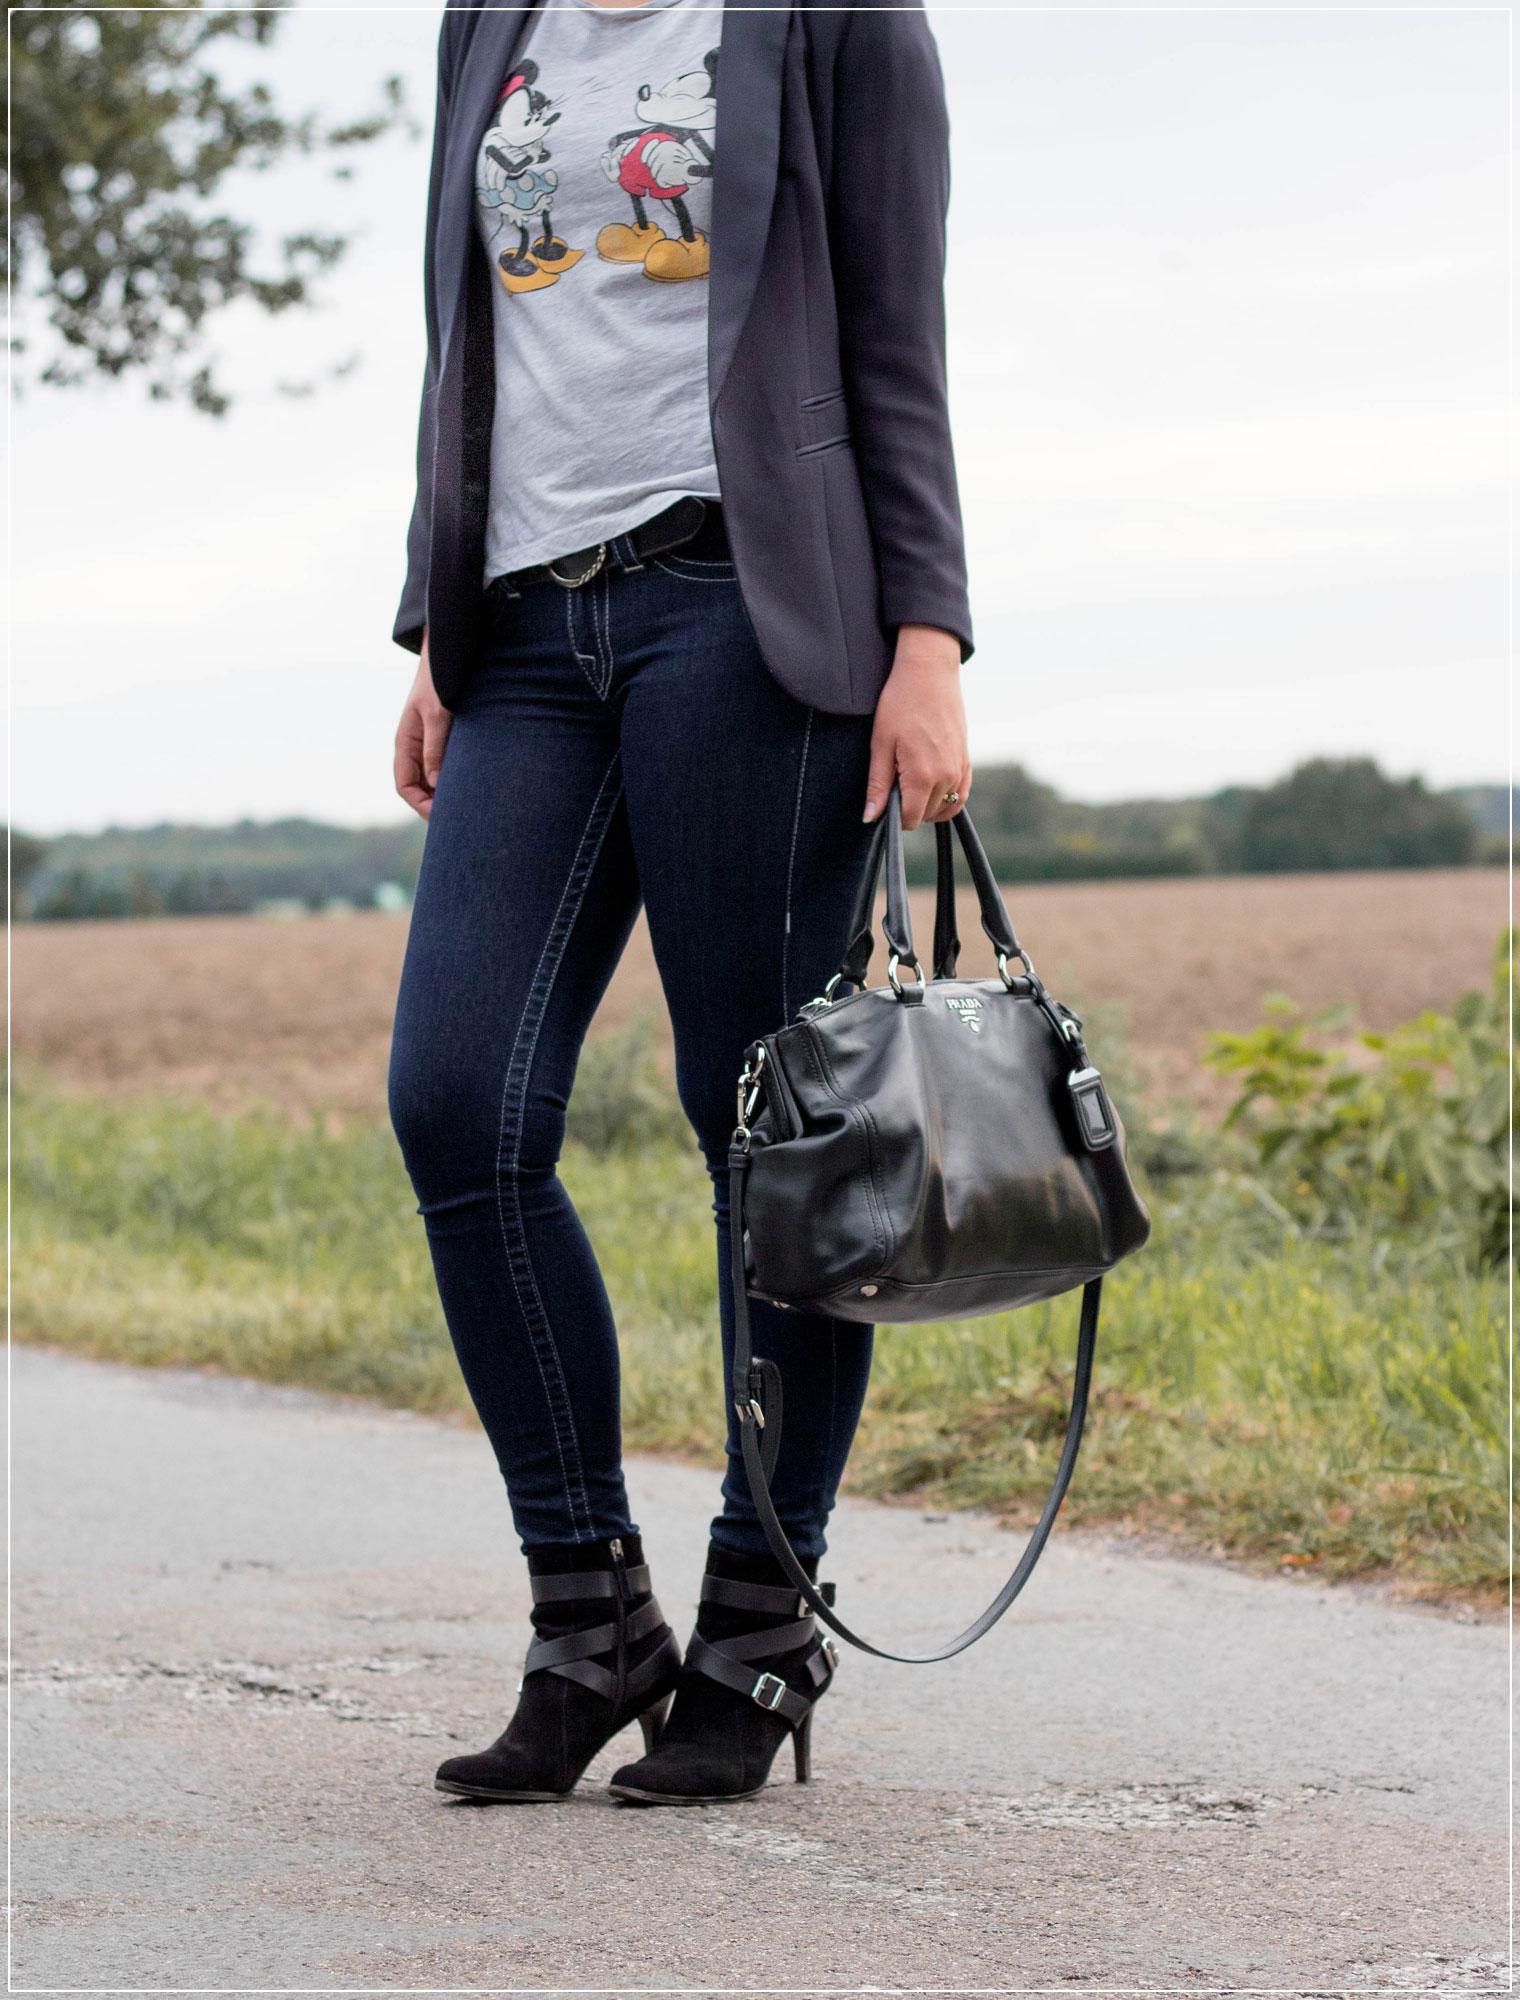 Logo-Shirt, Disney-Fashion, Logo-Print, Alltagslook, Modetrend, Styleguide, Outfitinspiration, Modebloggerin, Fashionbloggerin, Modeblog, Ruhrgebiet